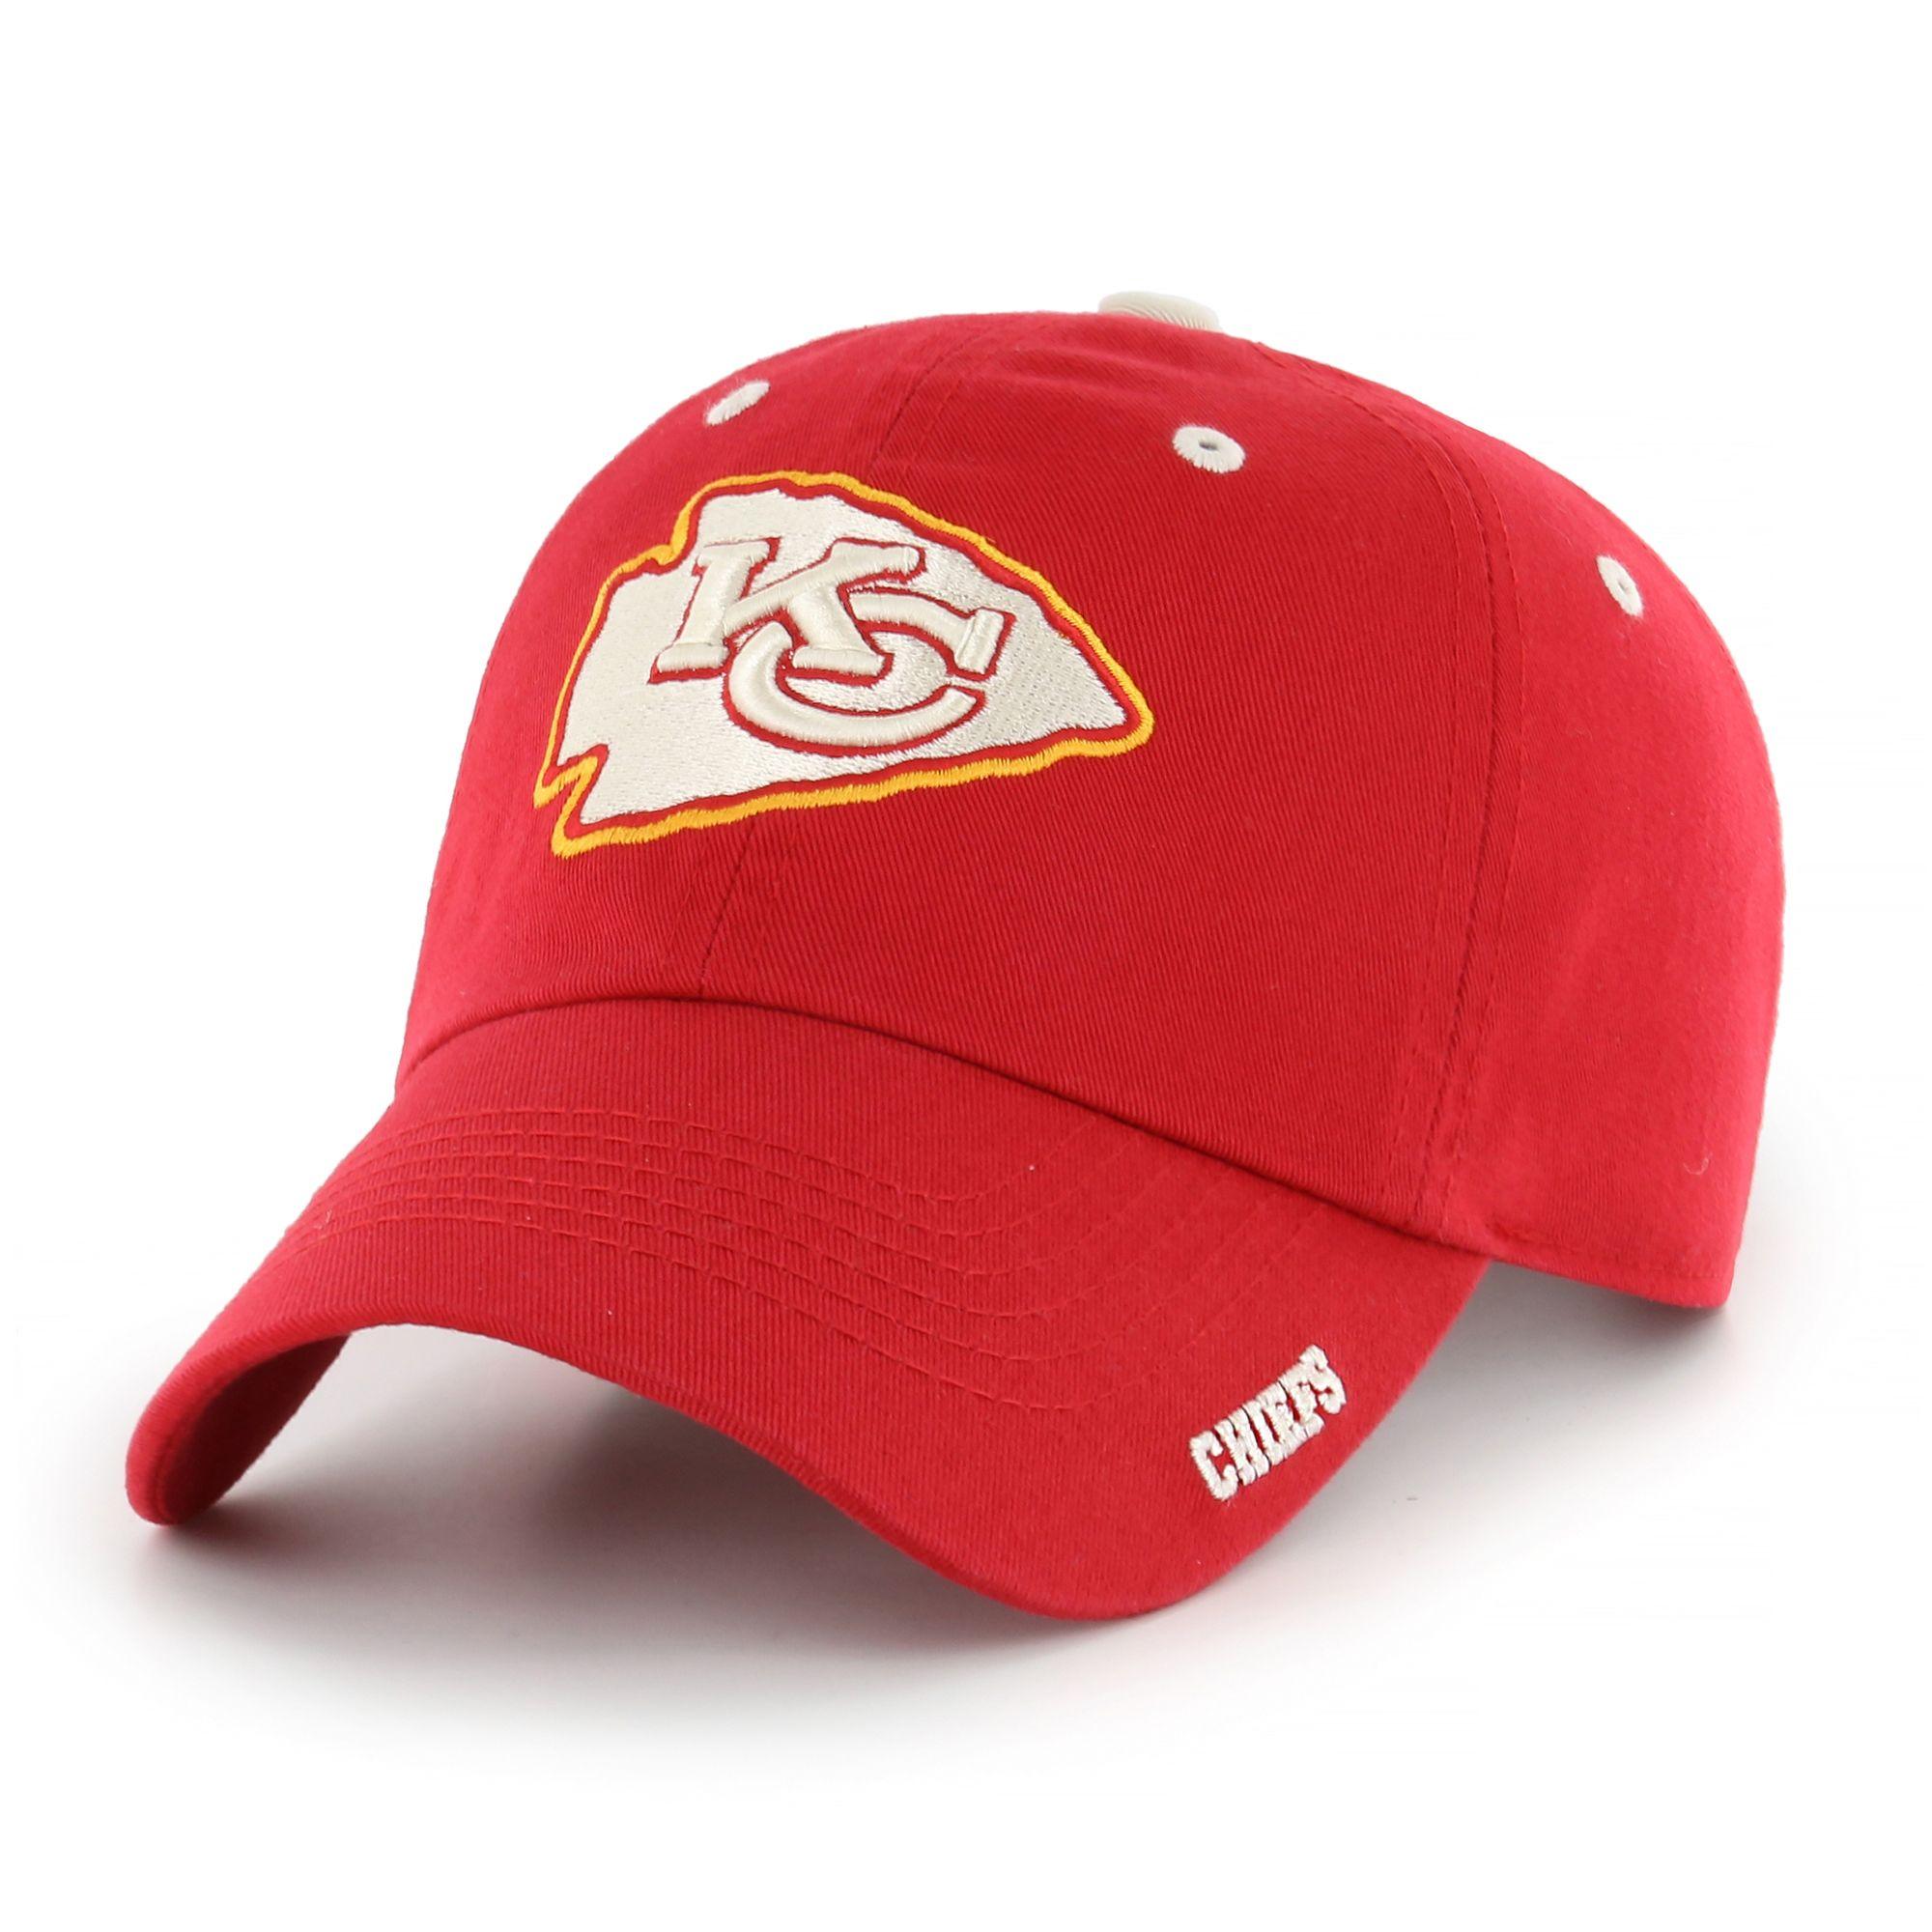 273d6240 Fan Favorites NFL Kansas City Chiefs Ice Adjustable Hat, Size: One ...